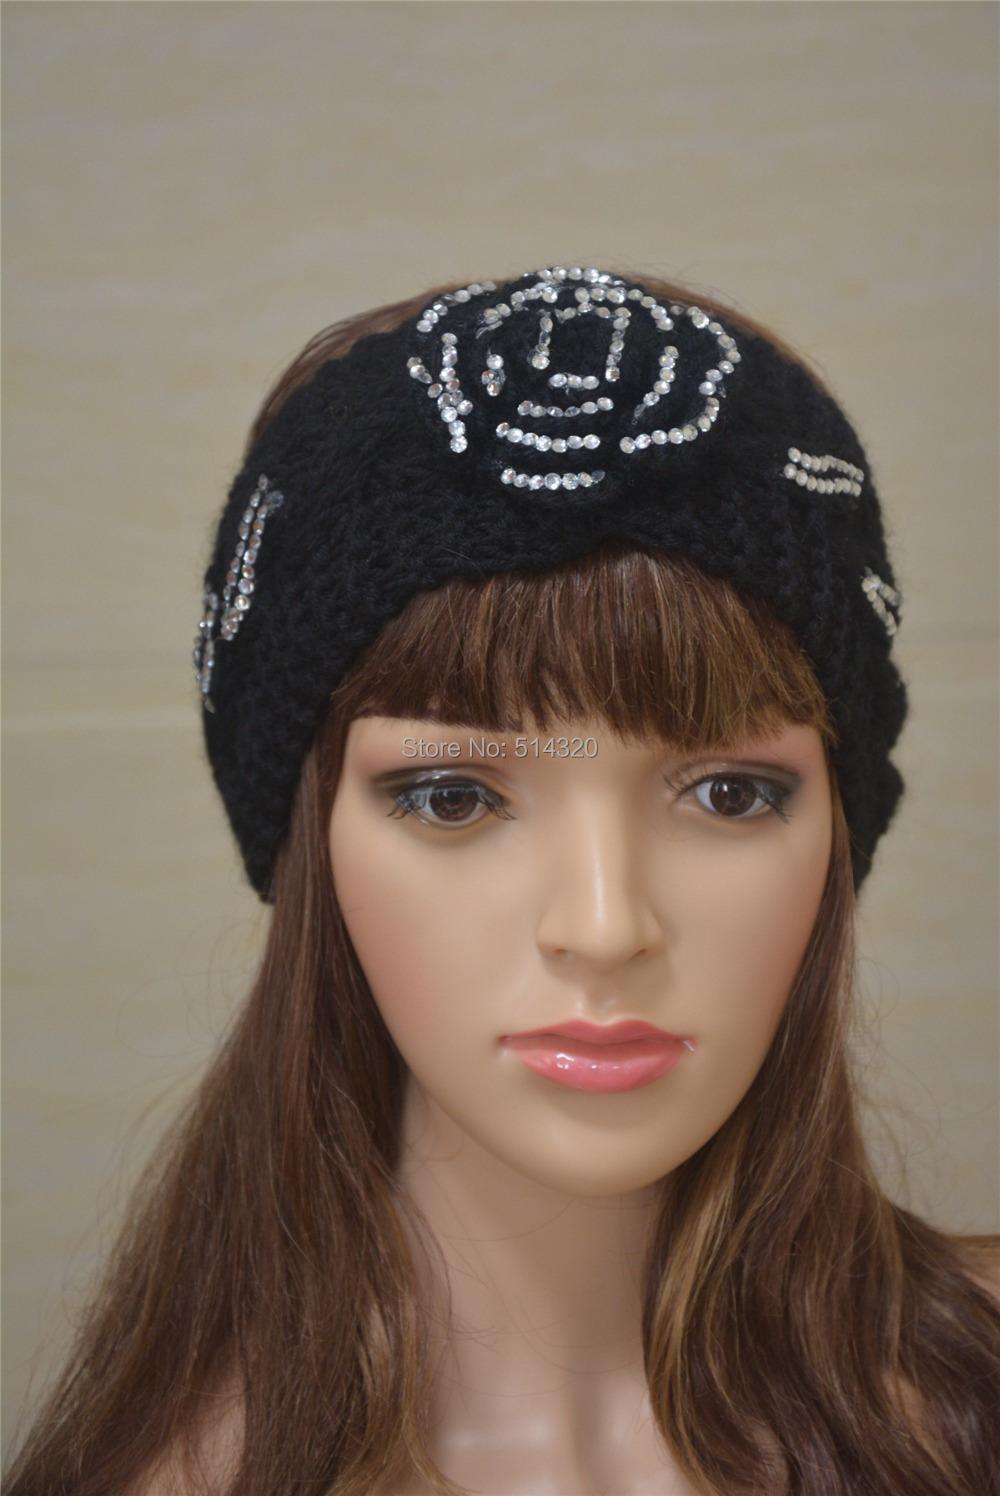 A098 Black Womens Rhinestone Flower trimme Headband HAIRBAND STRETCH Ear Warmer(China (Mainland))